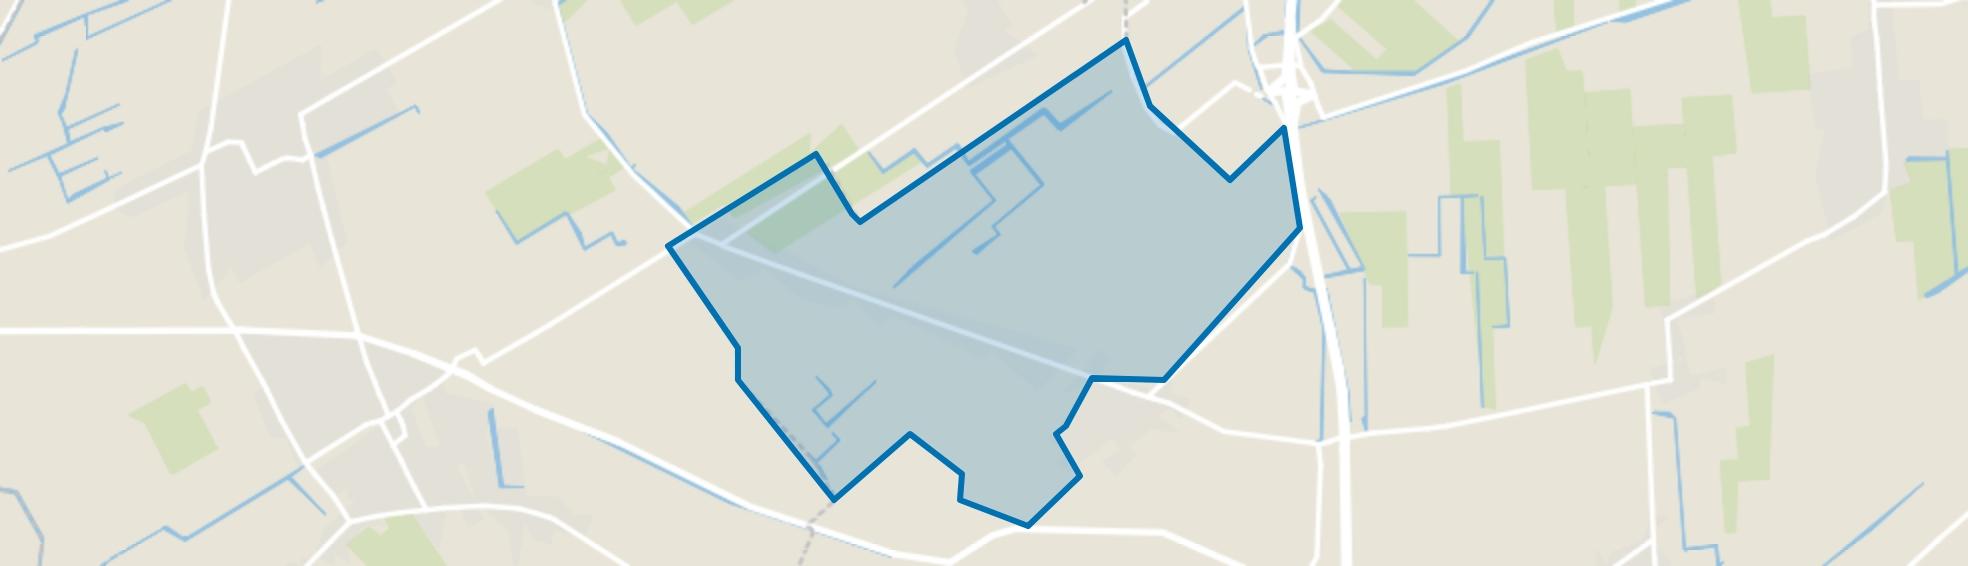 Sijbekarspel Buitengebied, Sijbekarspel map